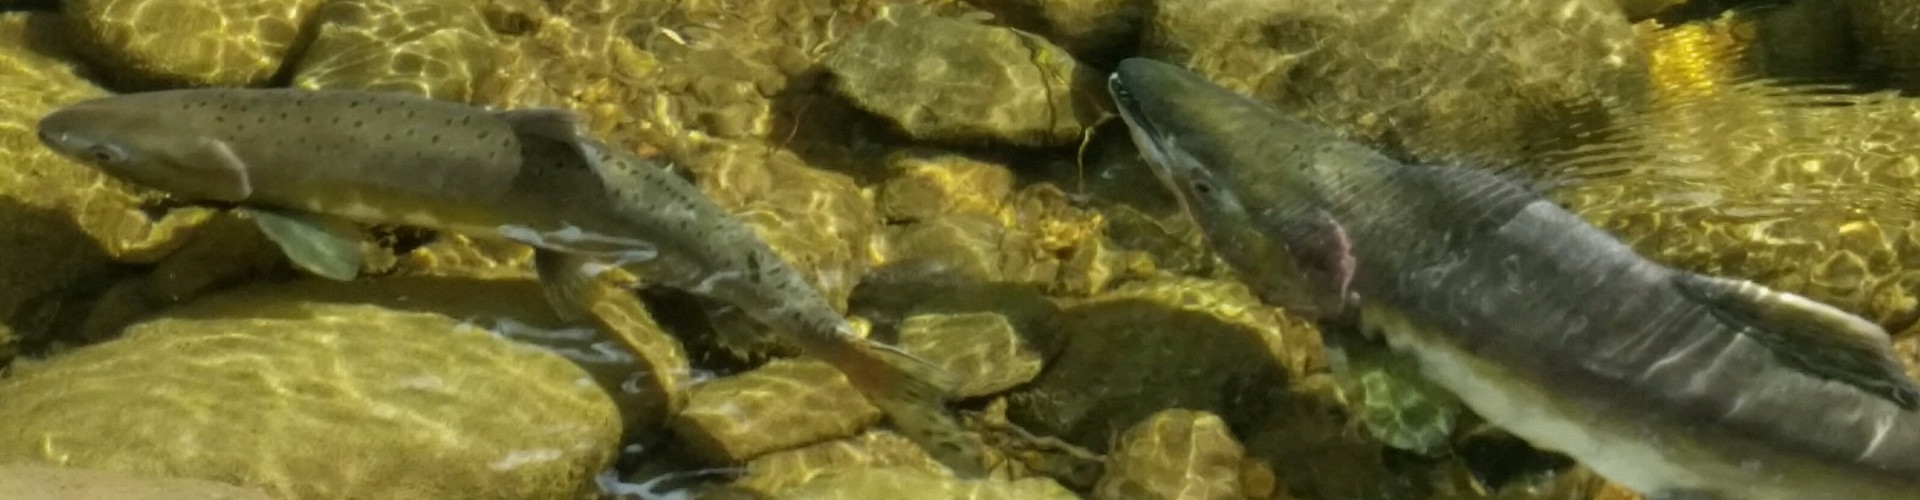 Pink salmon mashel cr 3 copy for Nisqually river fishing